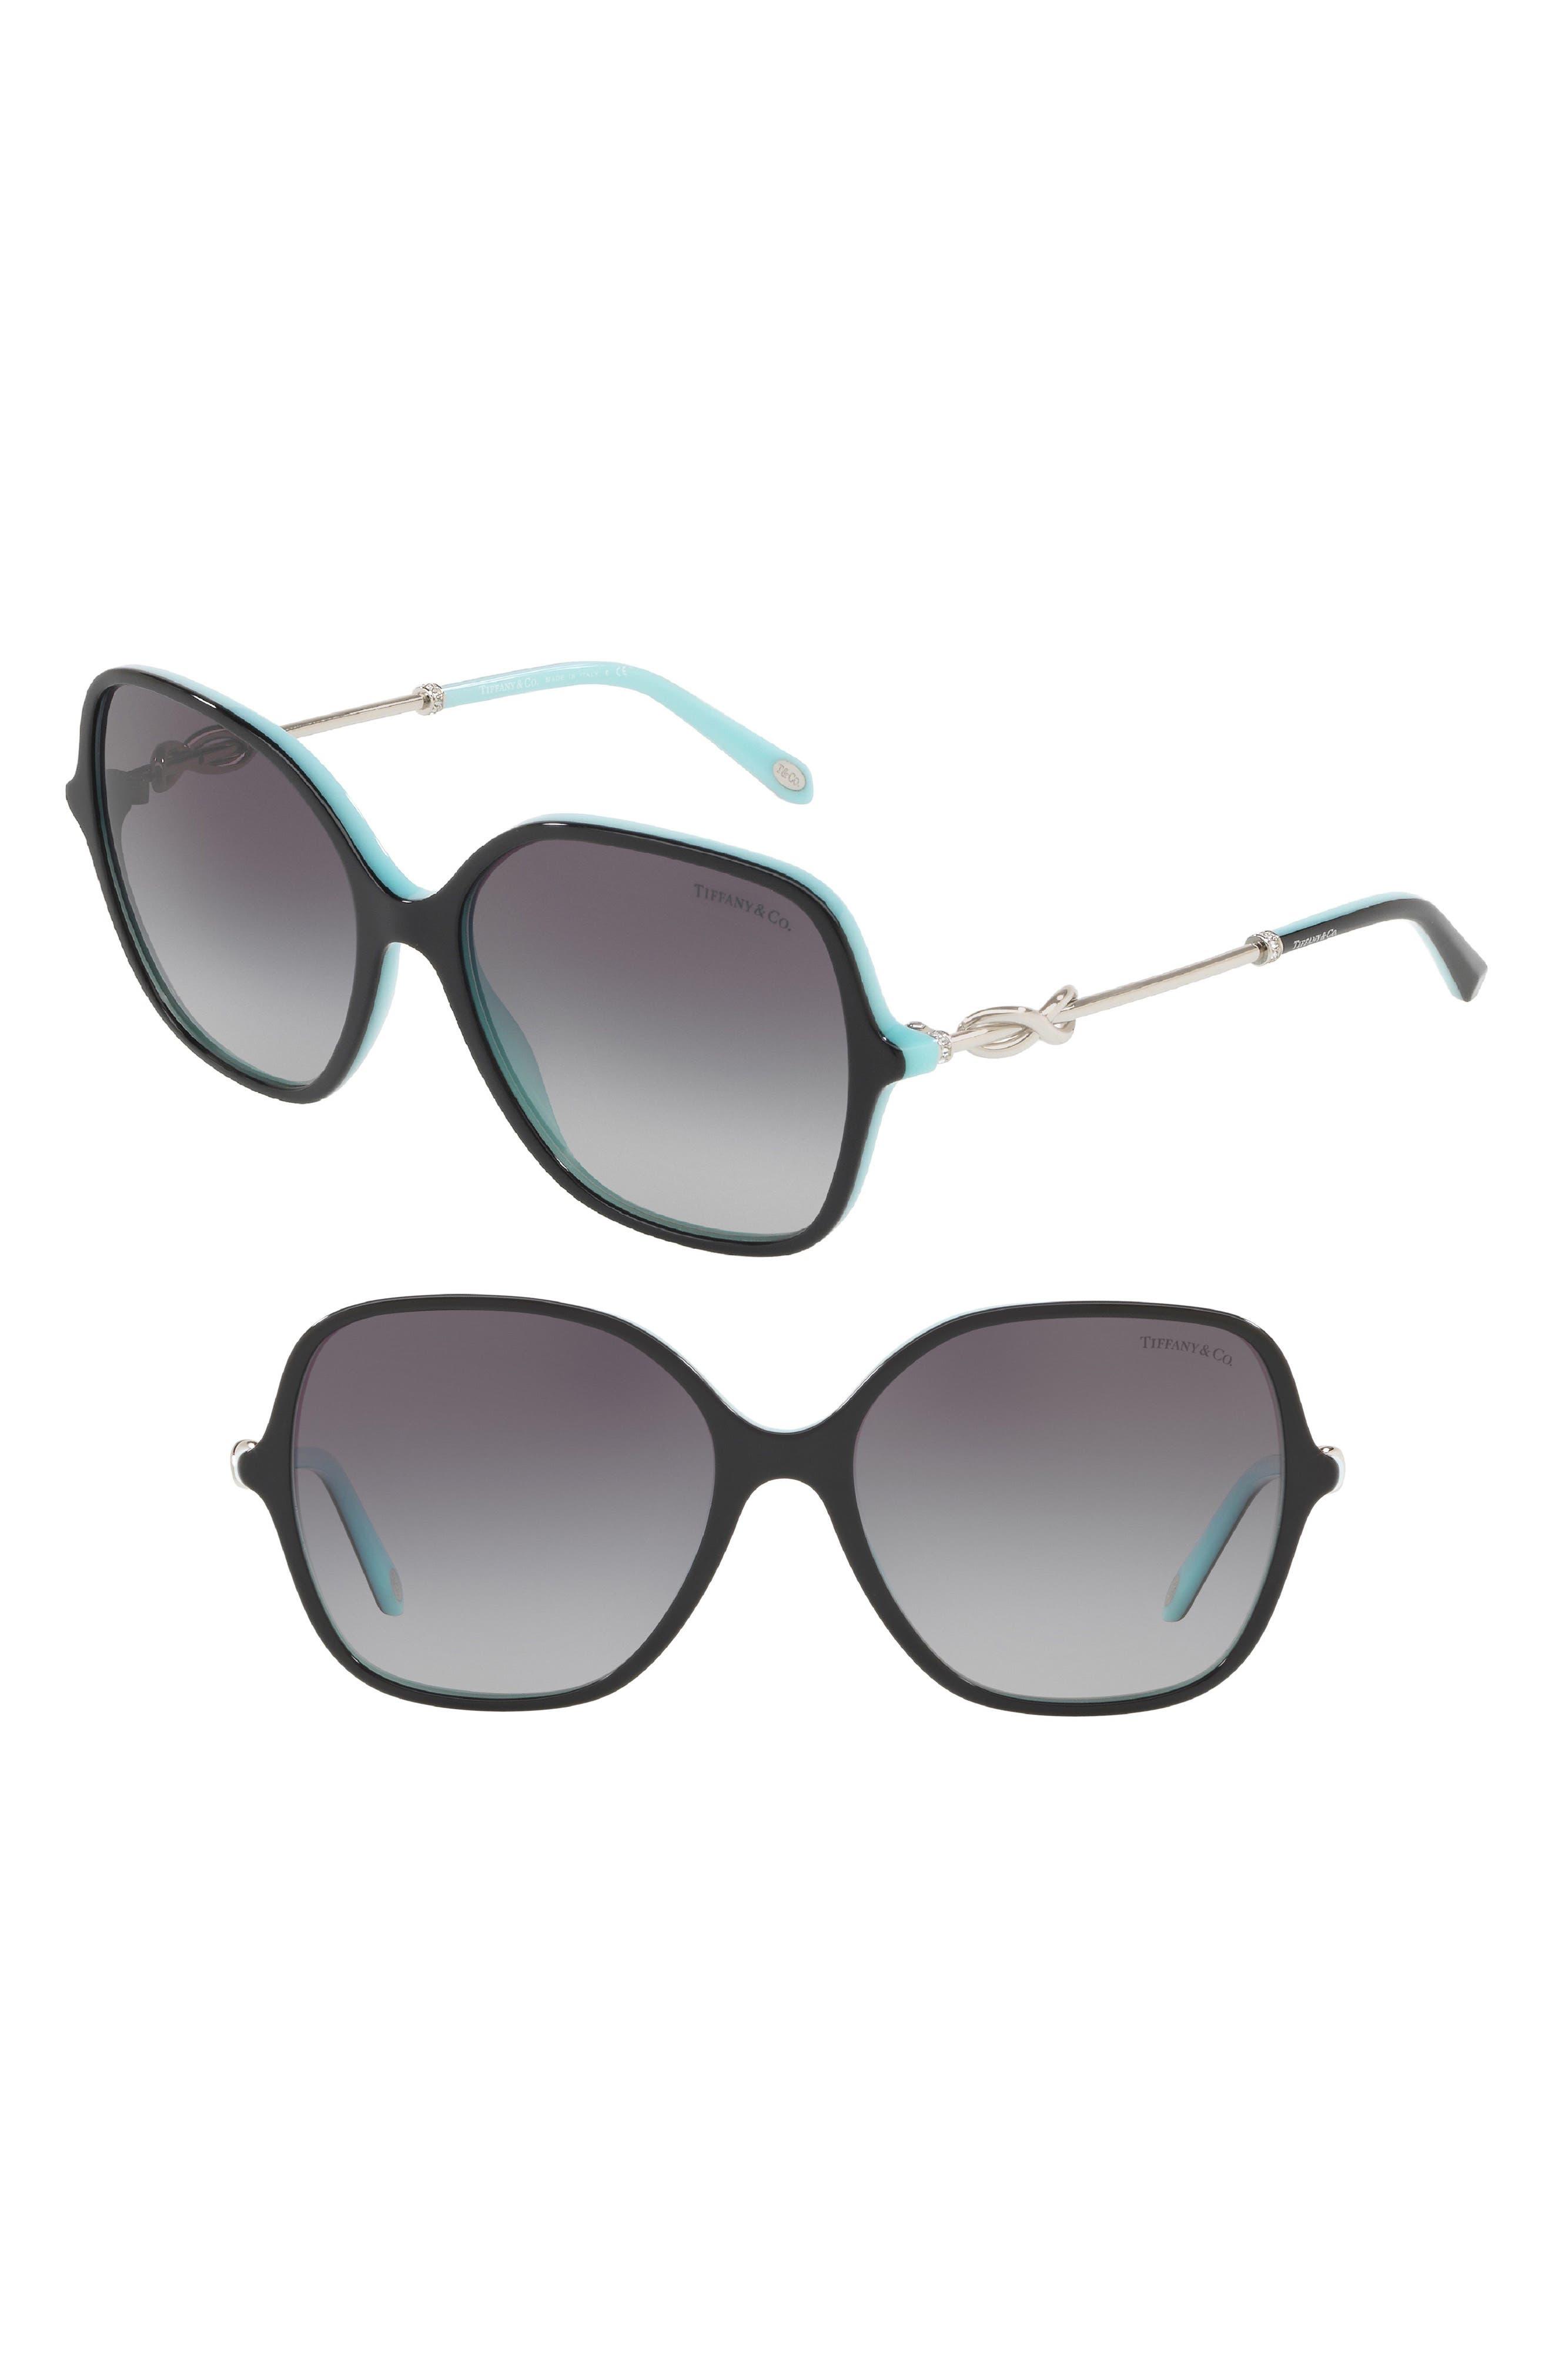 922fa3be0a2 Women s Tiffany 57Mm Sunglasses - Black  Blue Gradient